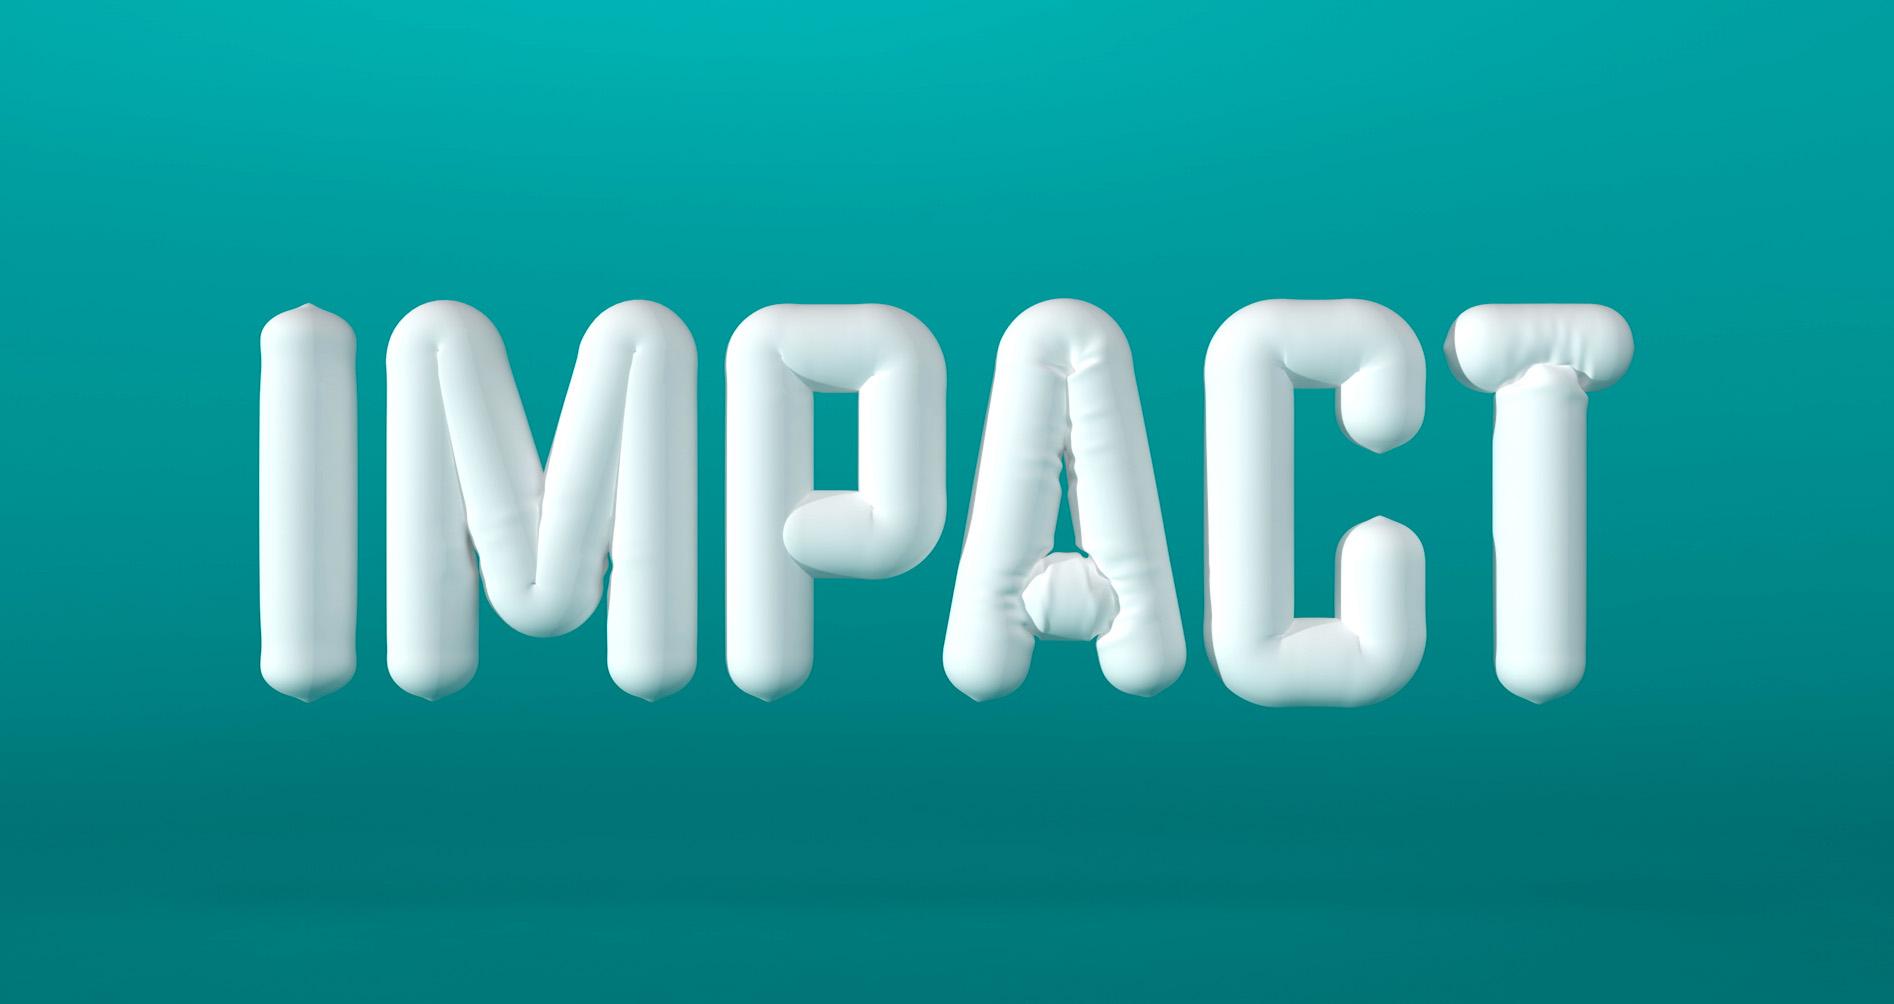 Impact_Text_GreenBg